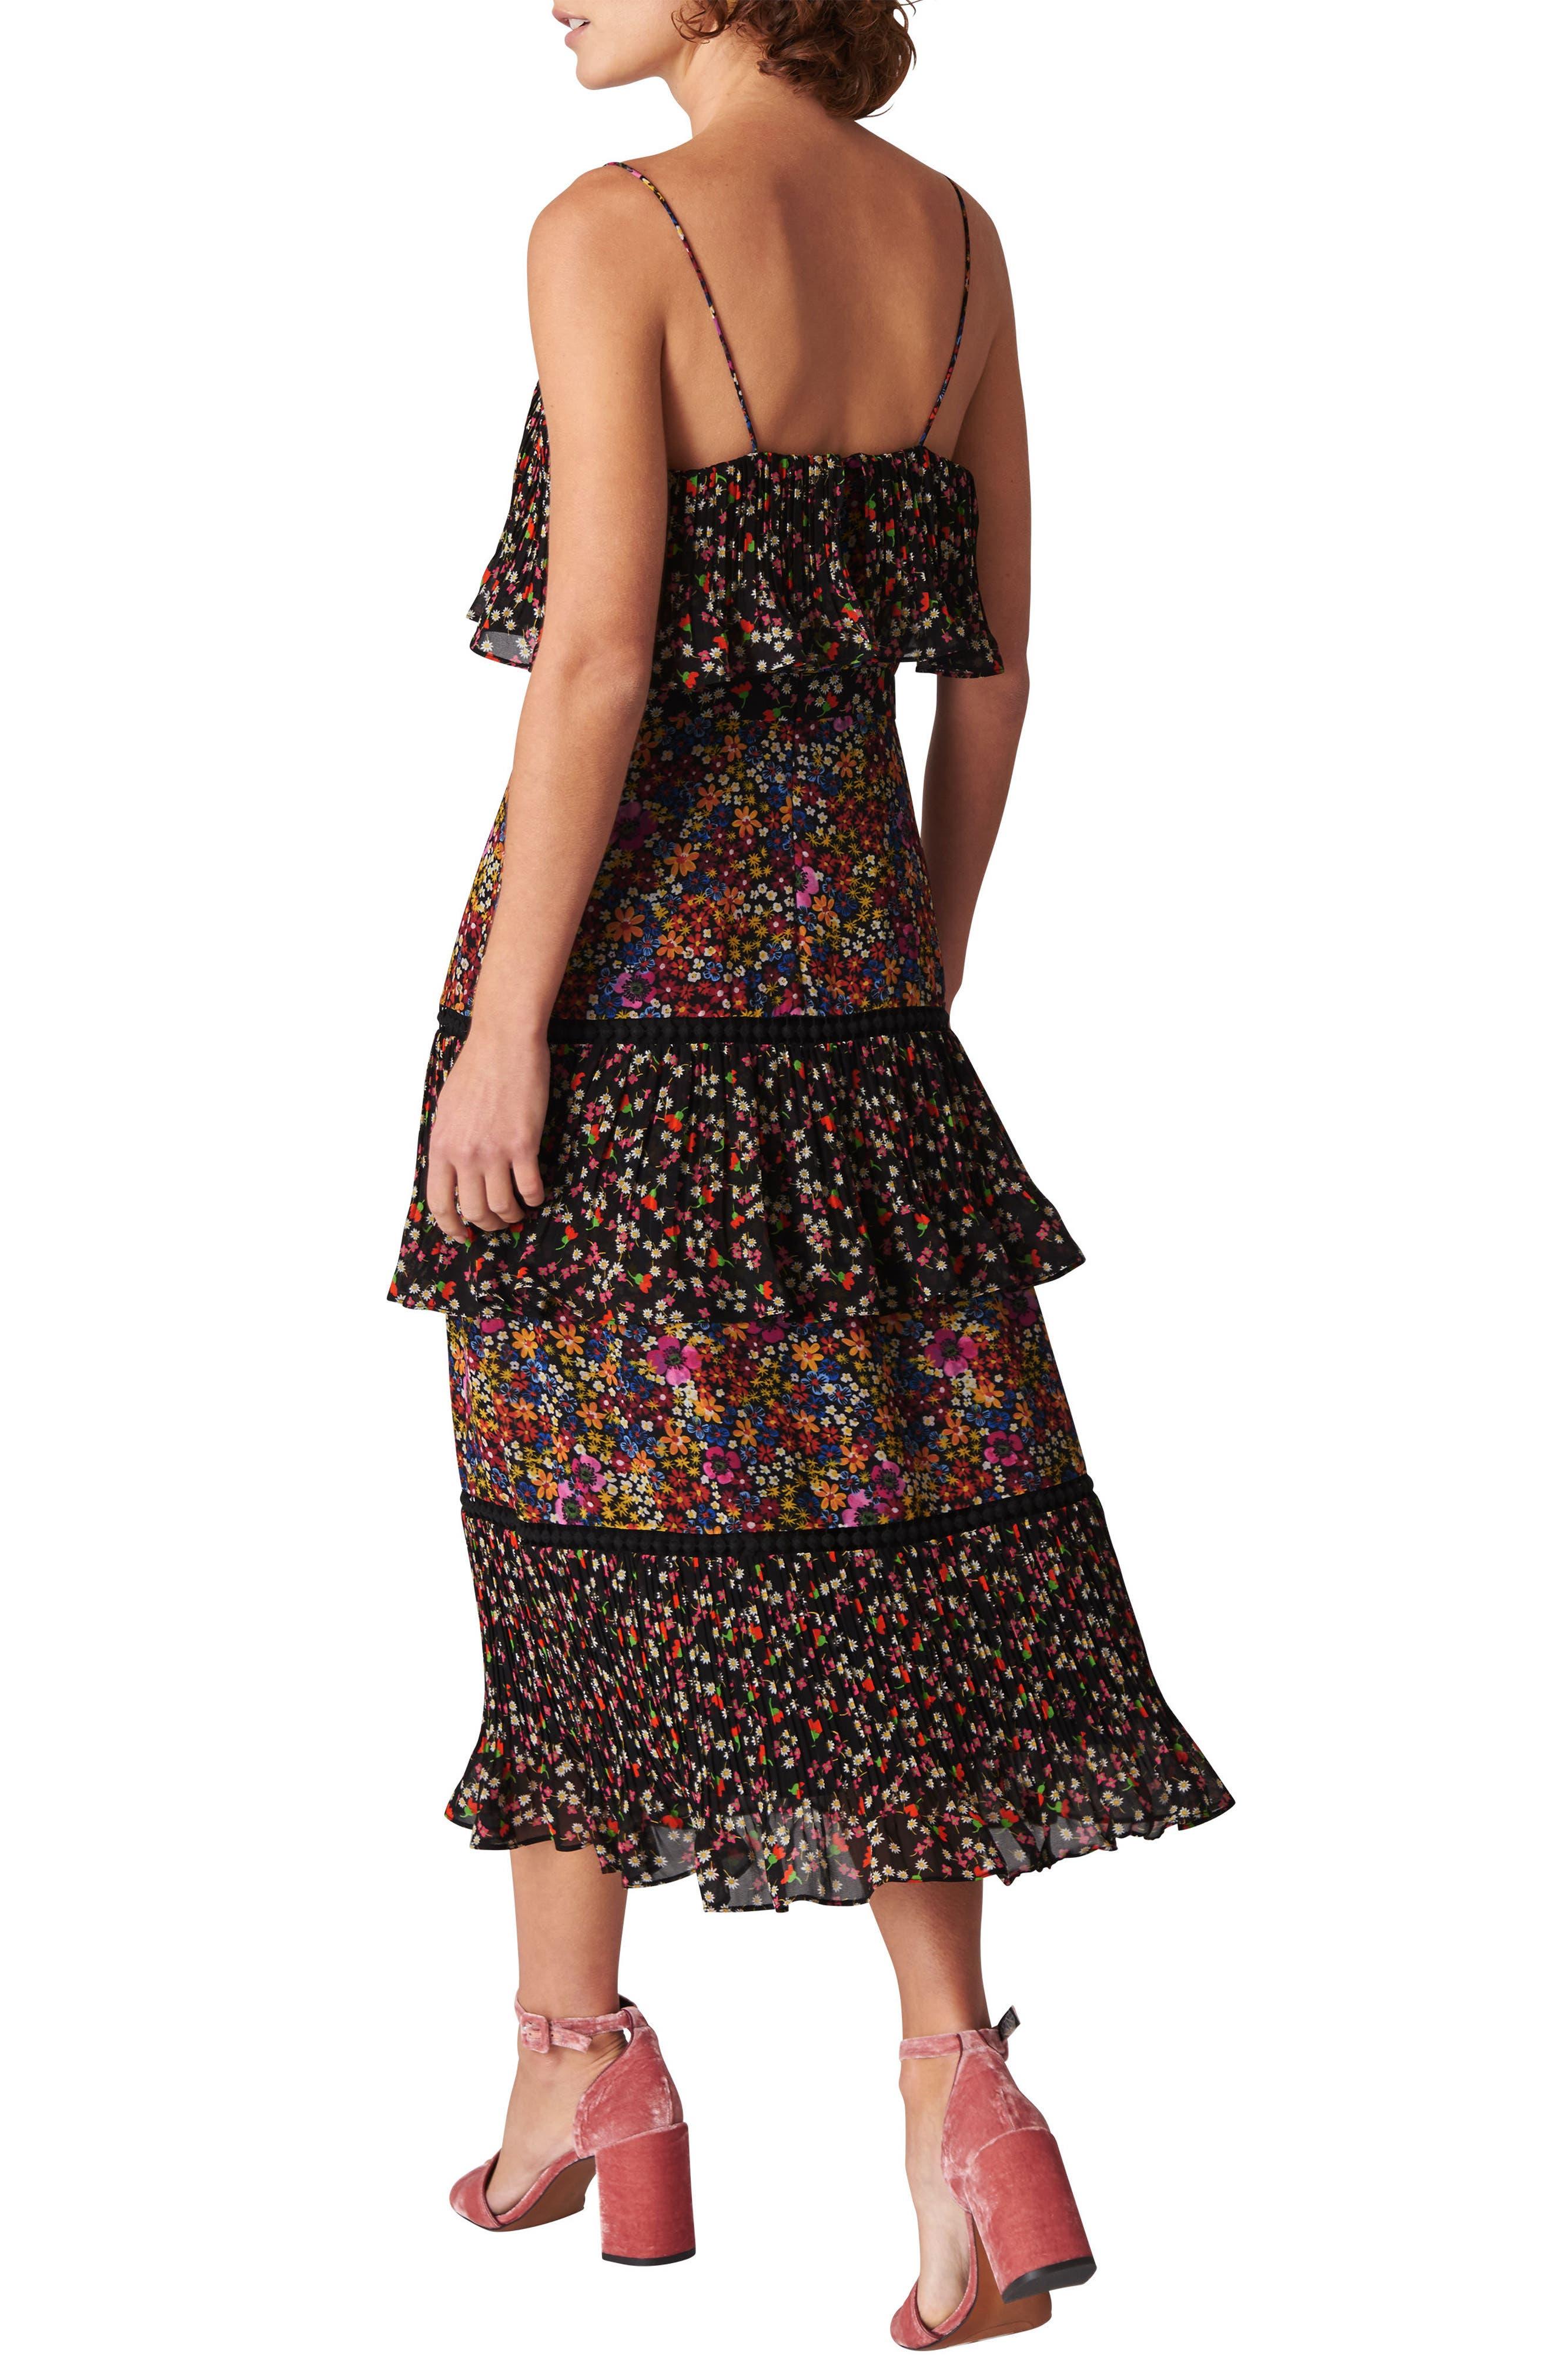 Skylar Peony Print Tiered Dress,                             Alternate thumbnail 2, color,                             BLACK/ MULTI